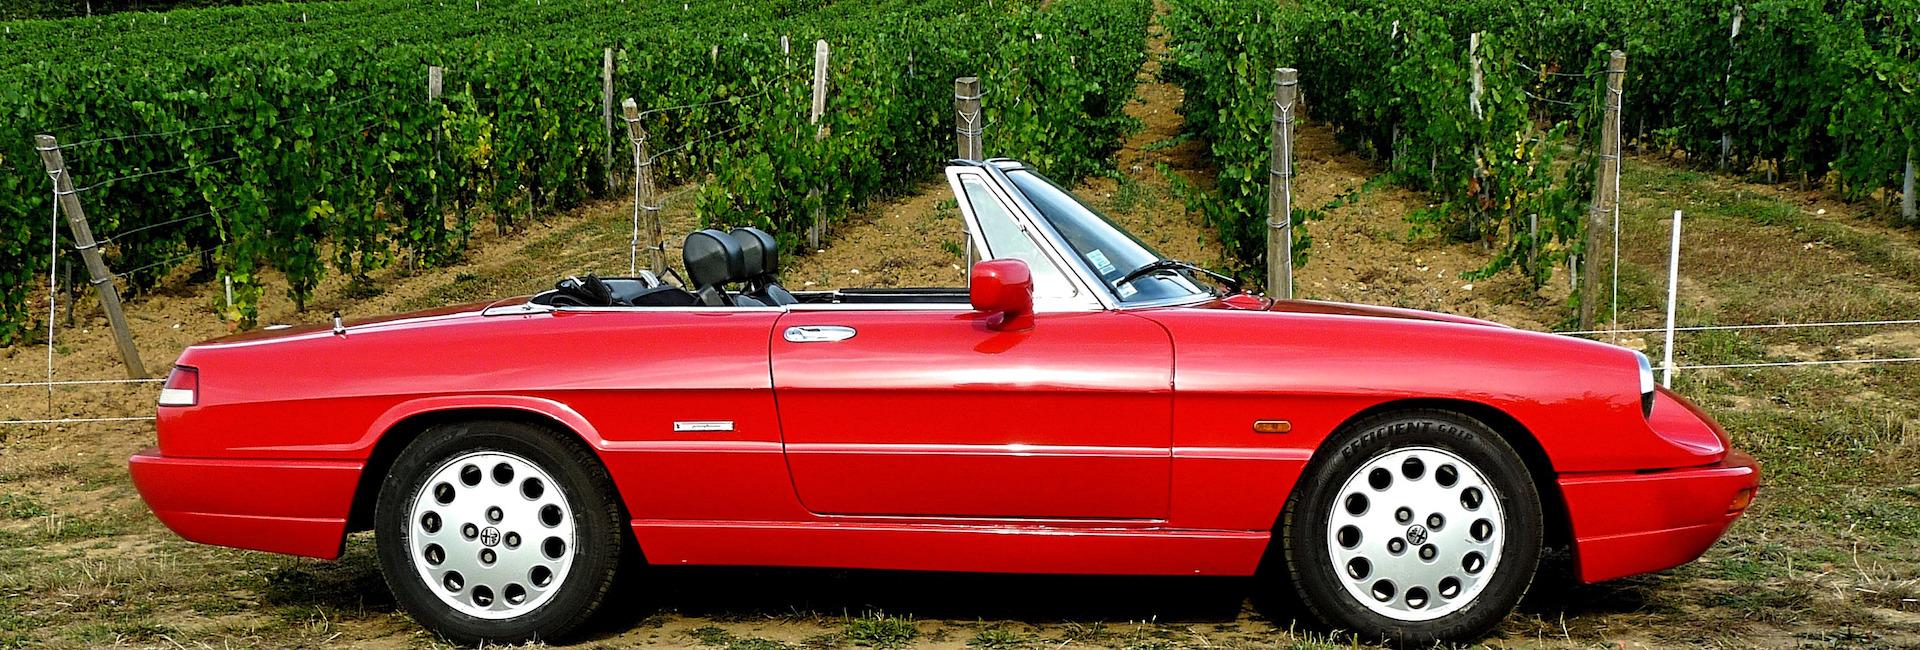 Alfa Romeo spider profil